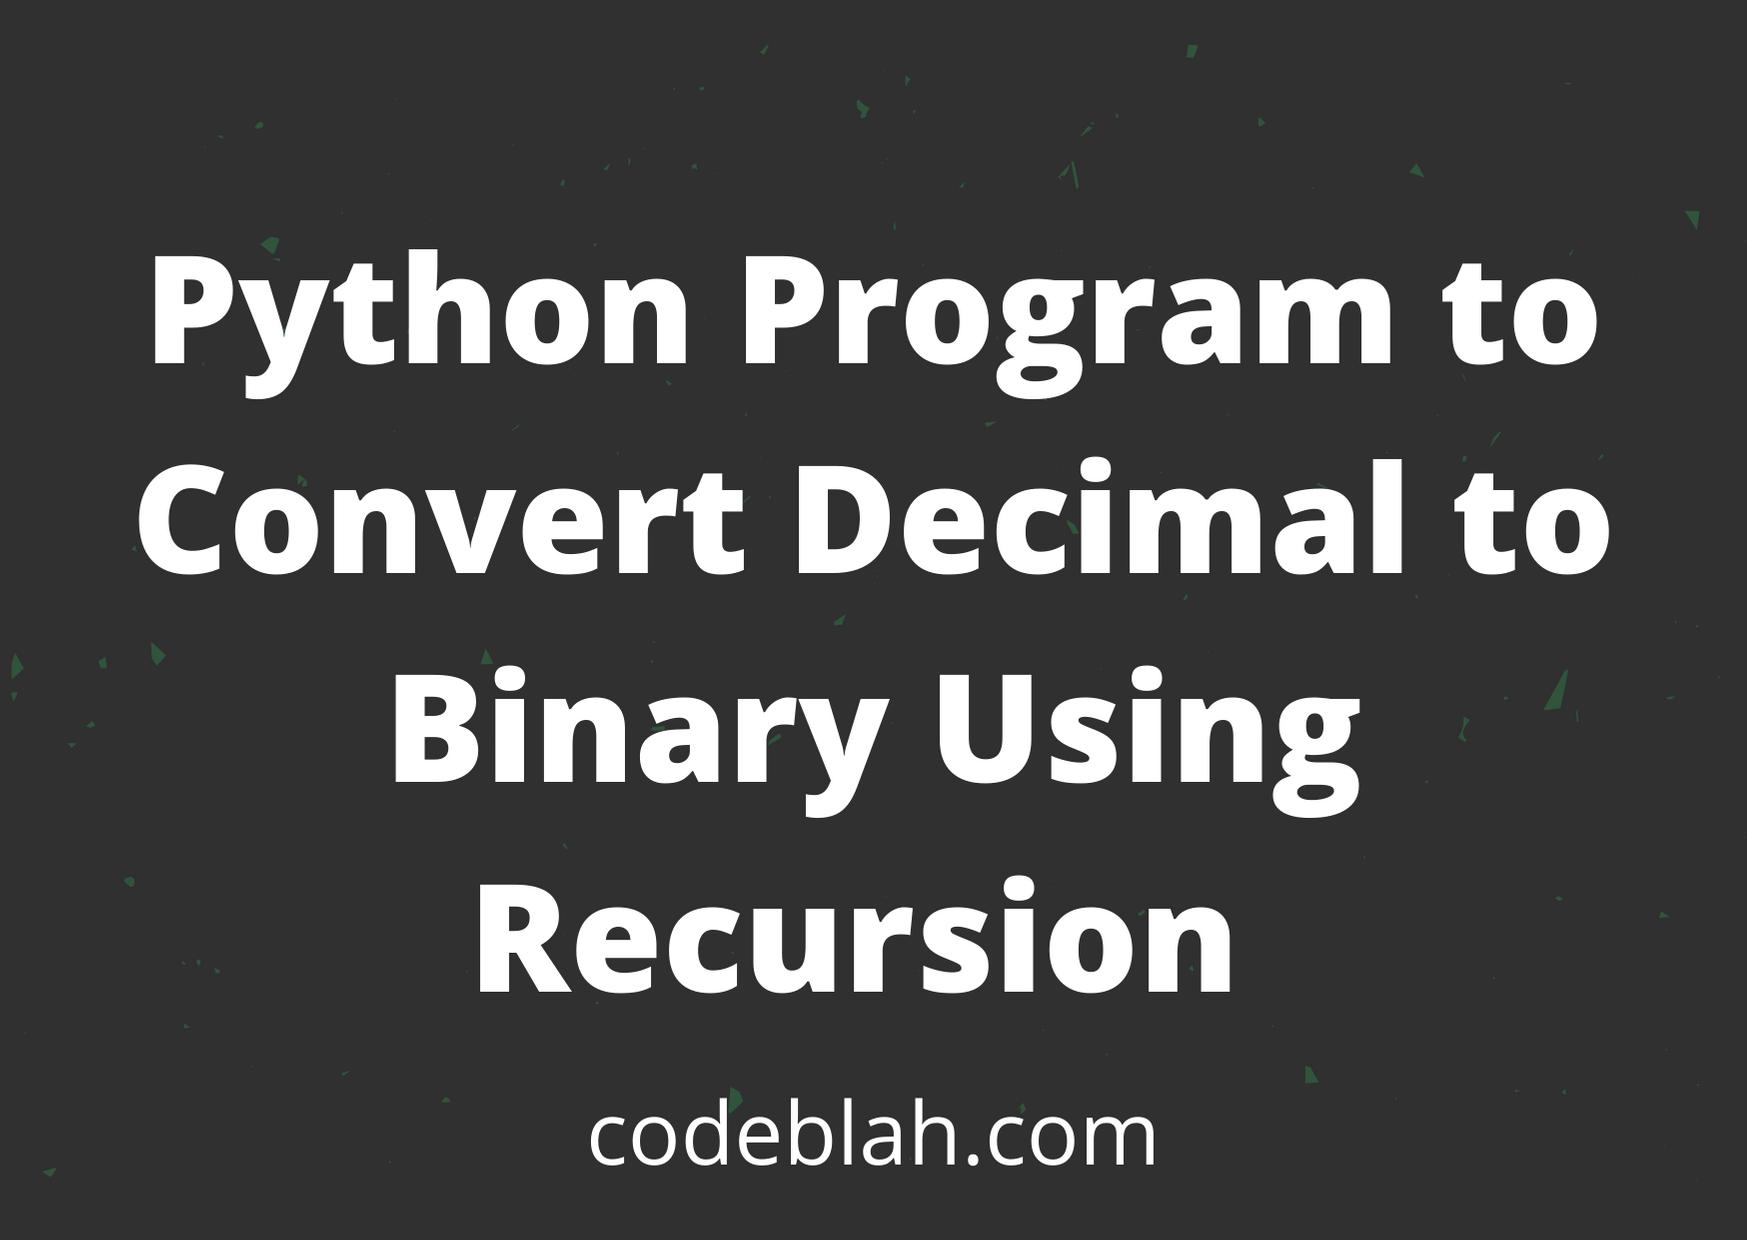 Python Program to Convert Decimal to Binary Using Recursion